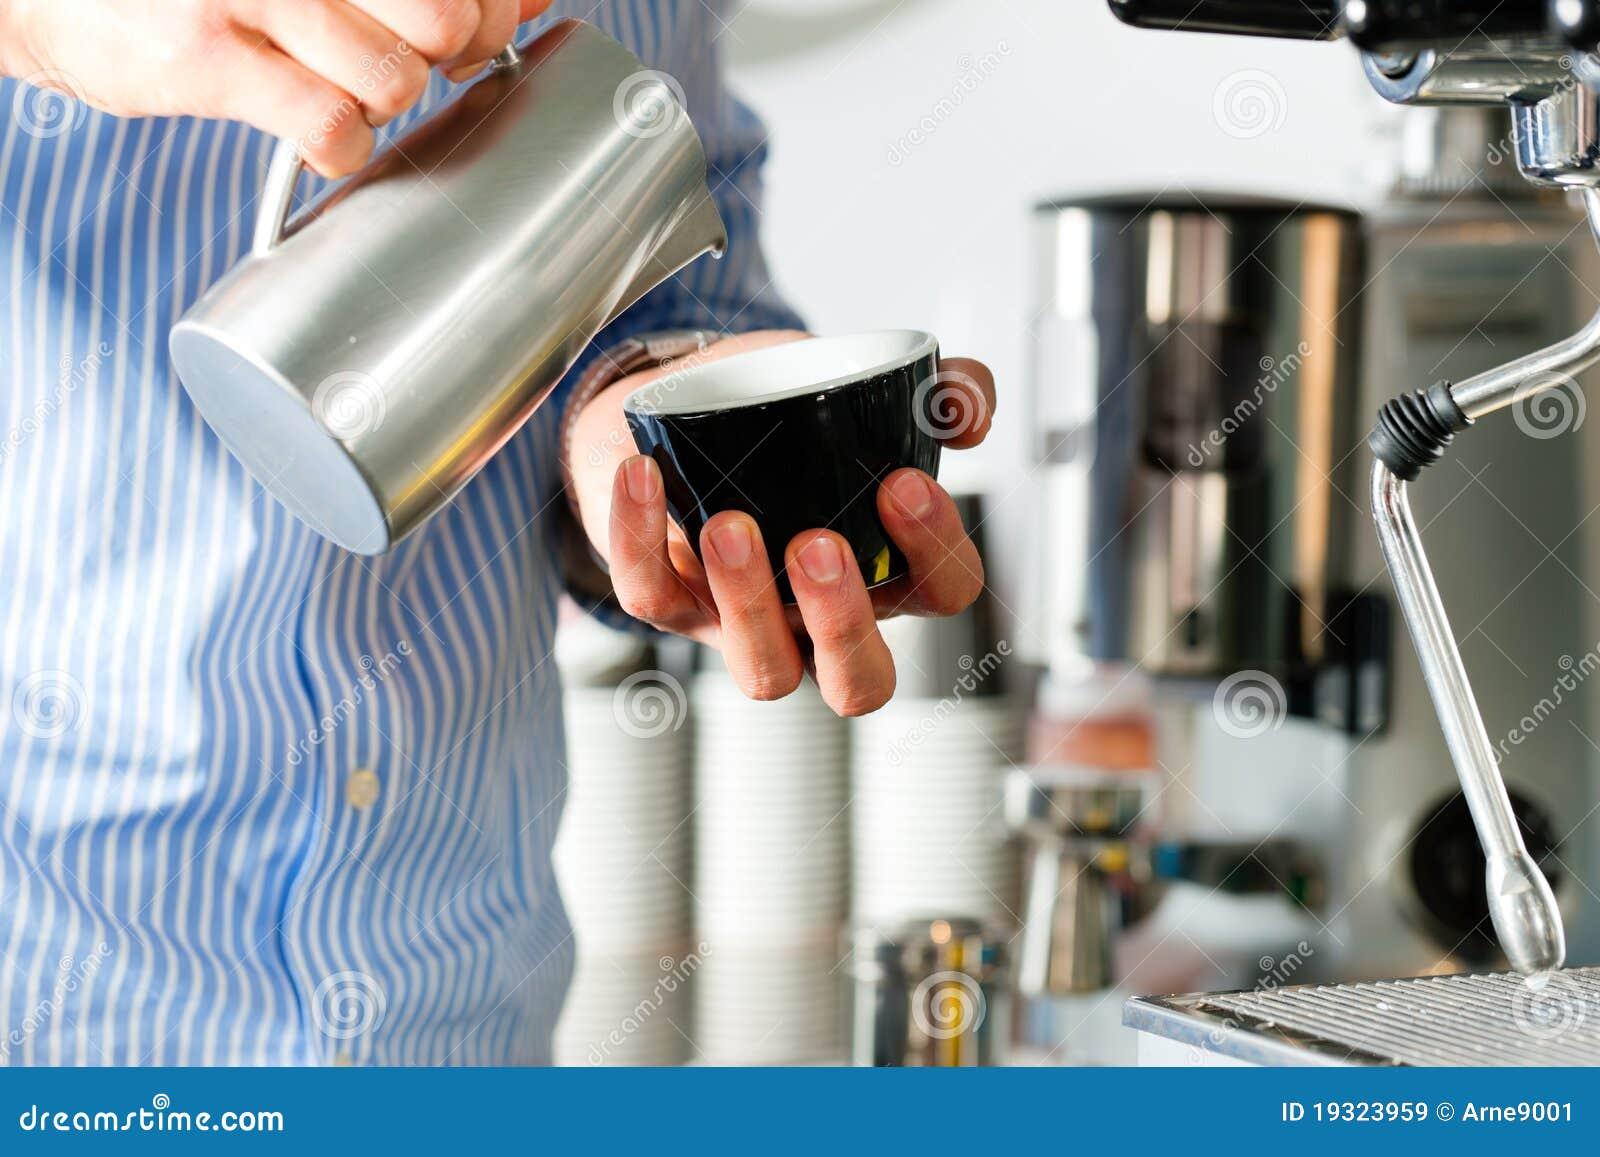 Barista prepares espresso